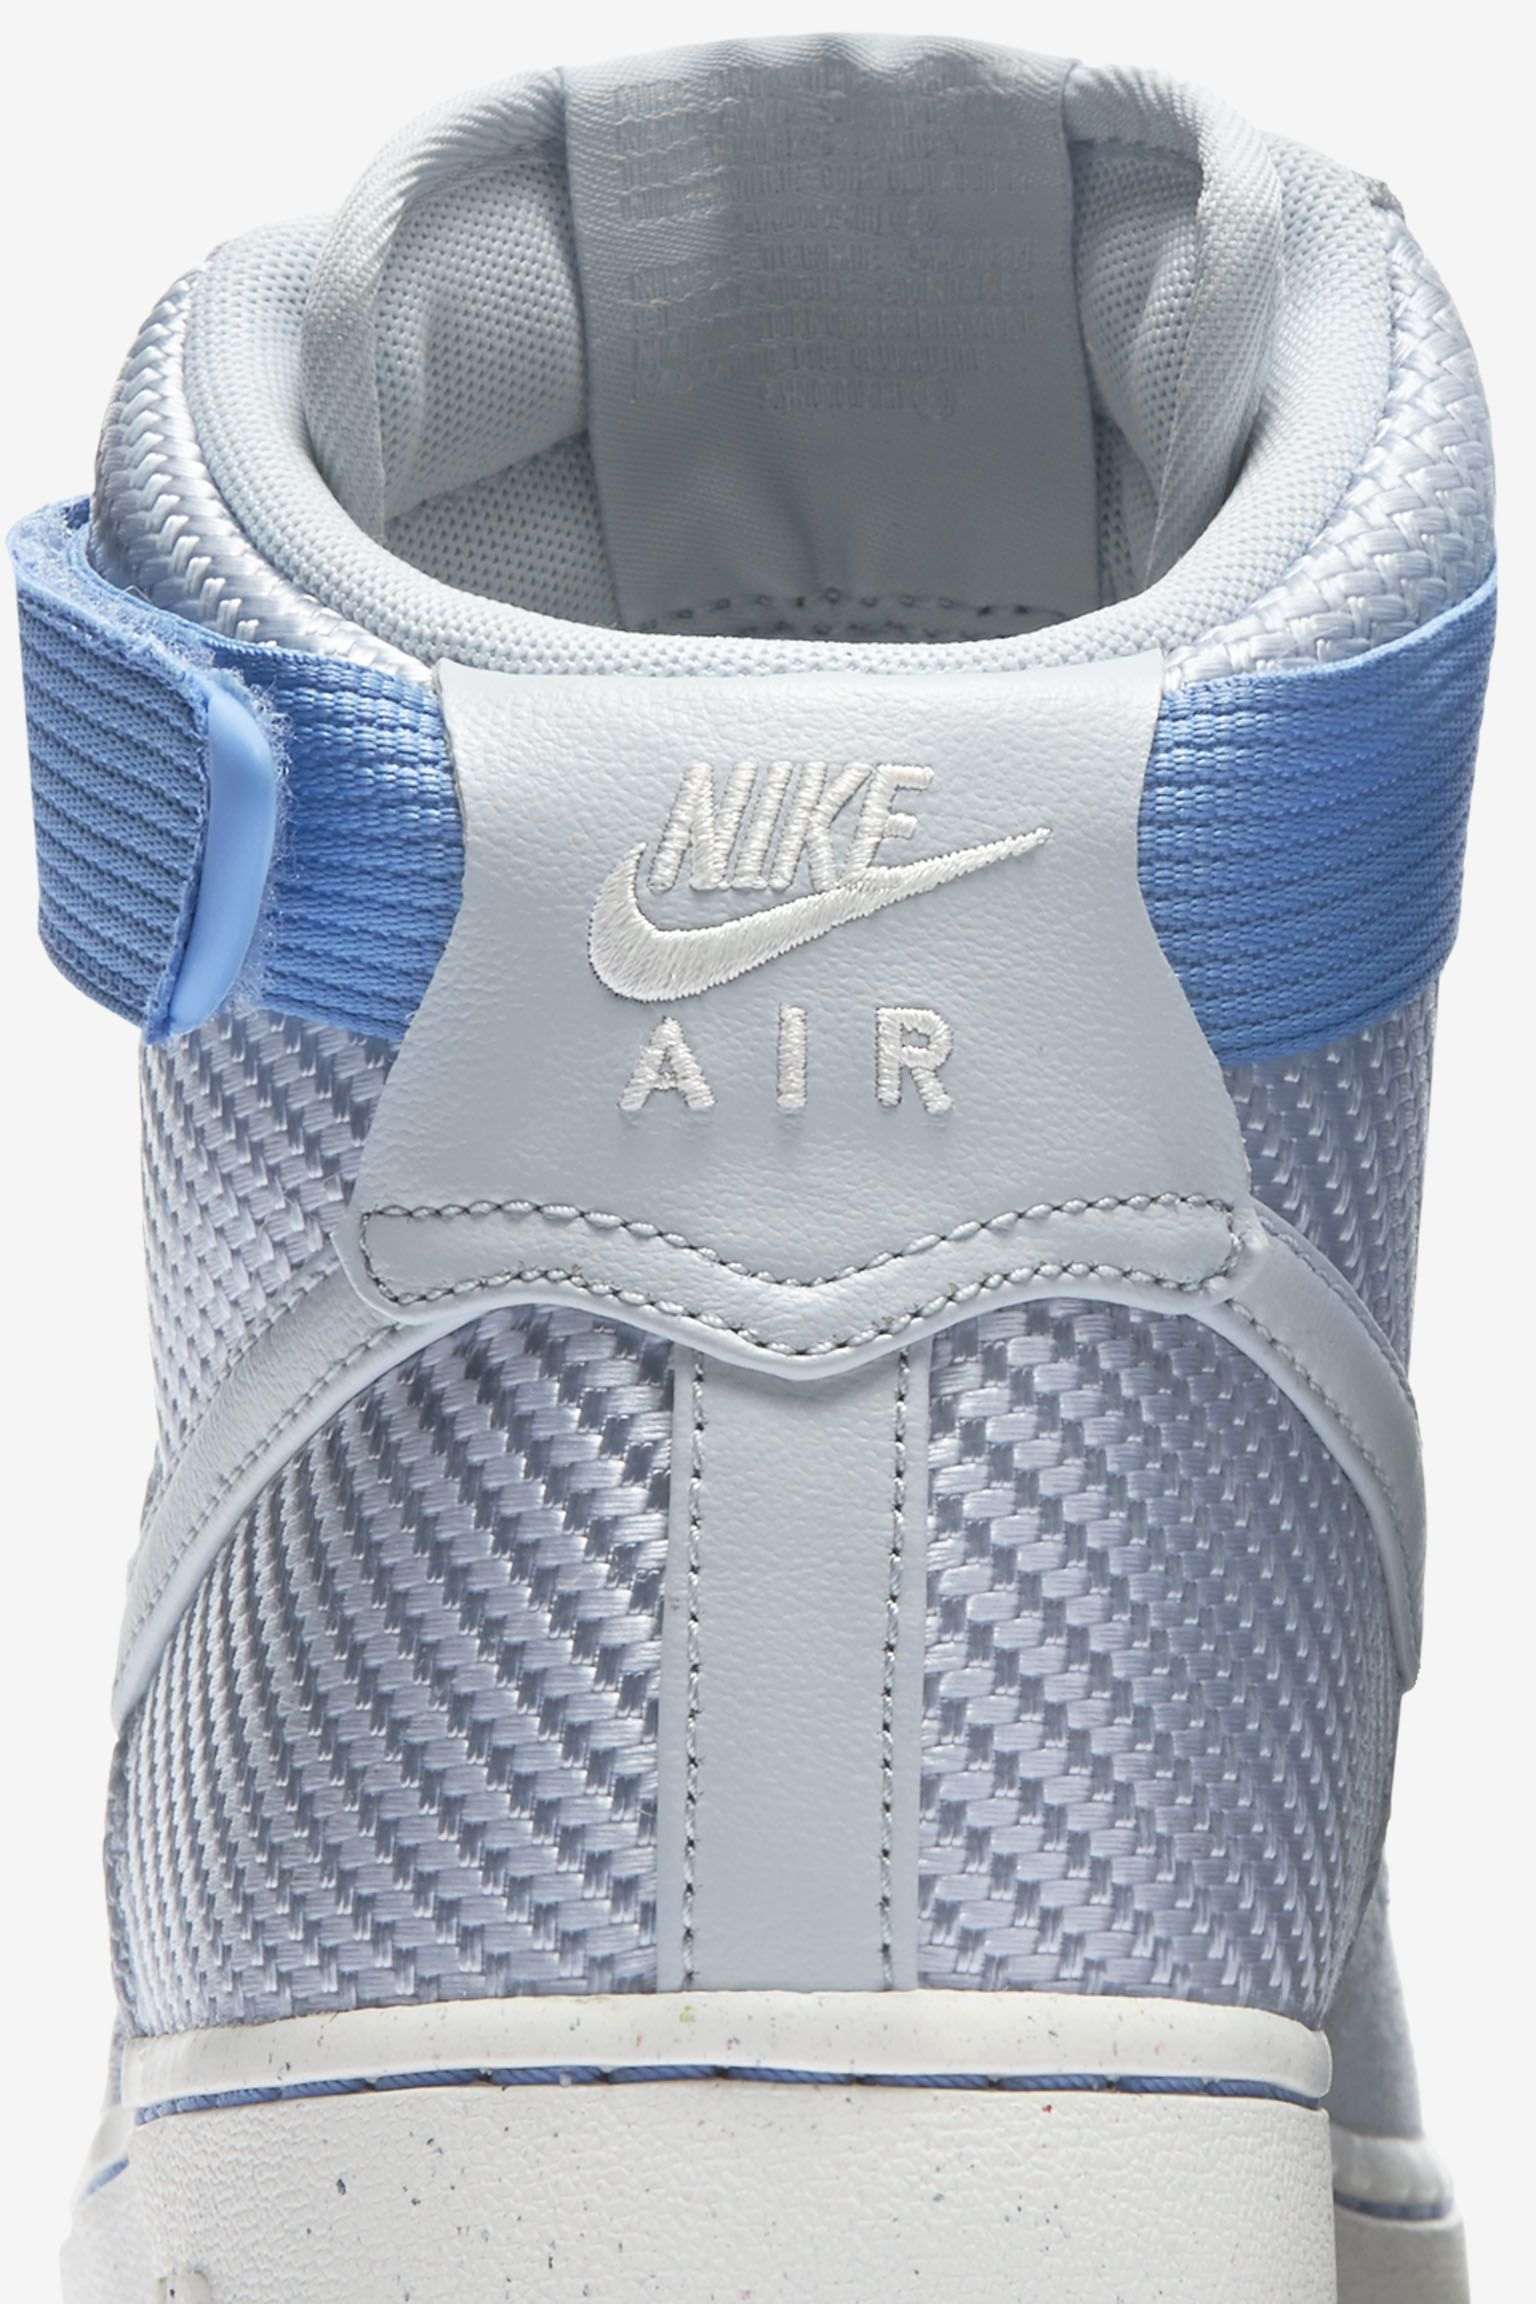 Women's Nike Air Force 1 'Porpoise'